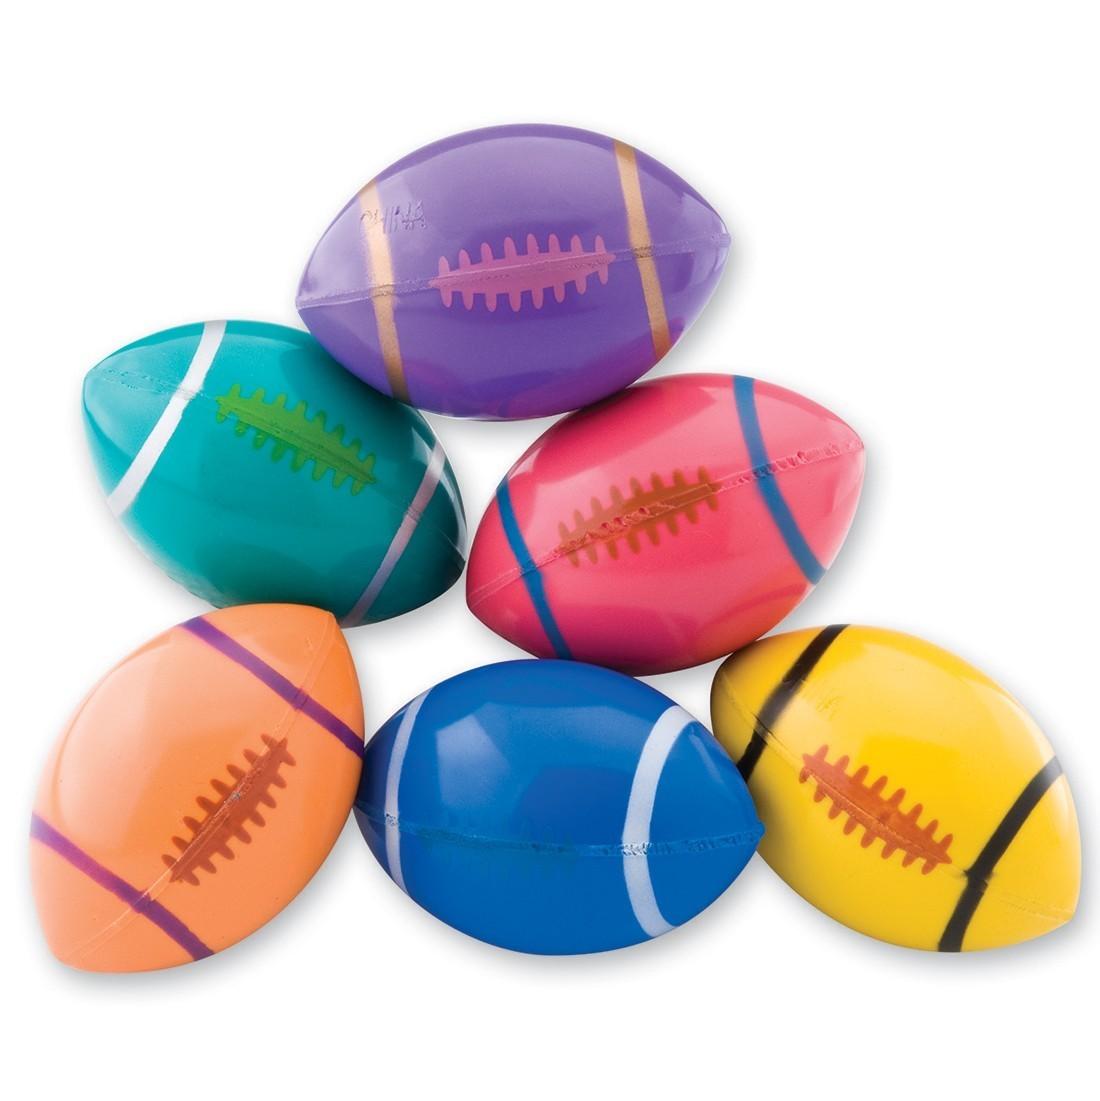 51mm Colorful Football Bouncing Balls [image]